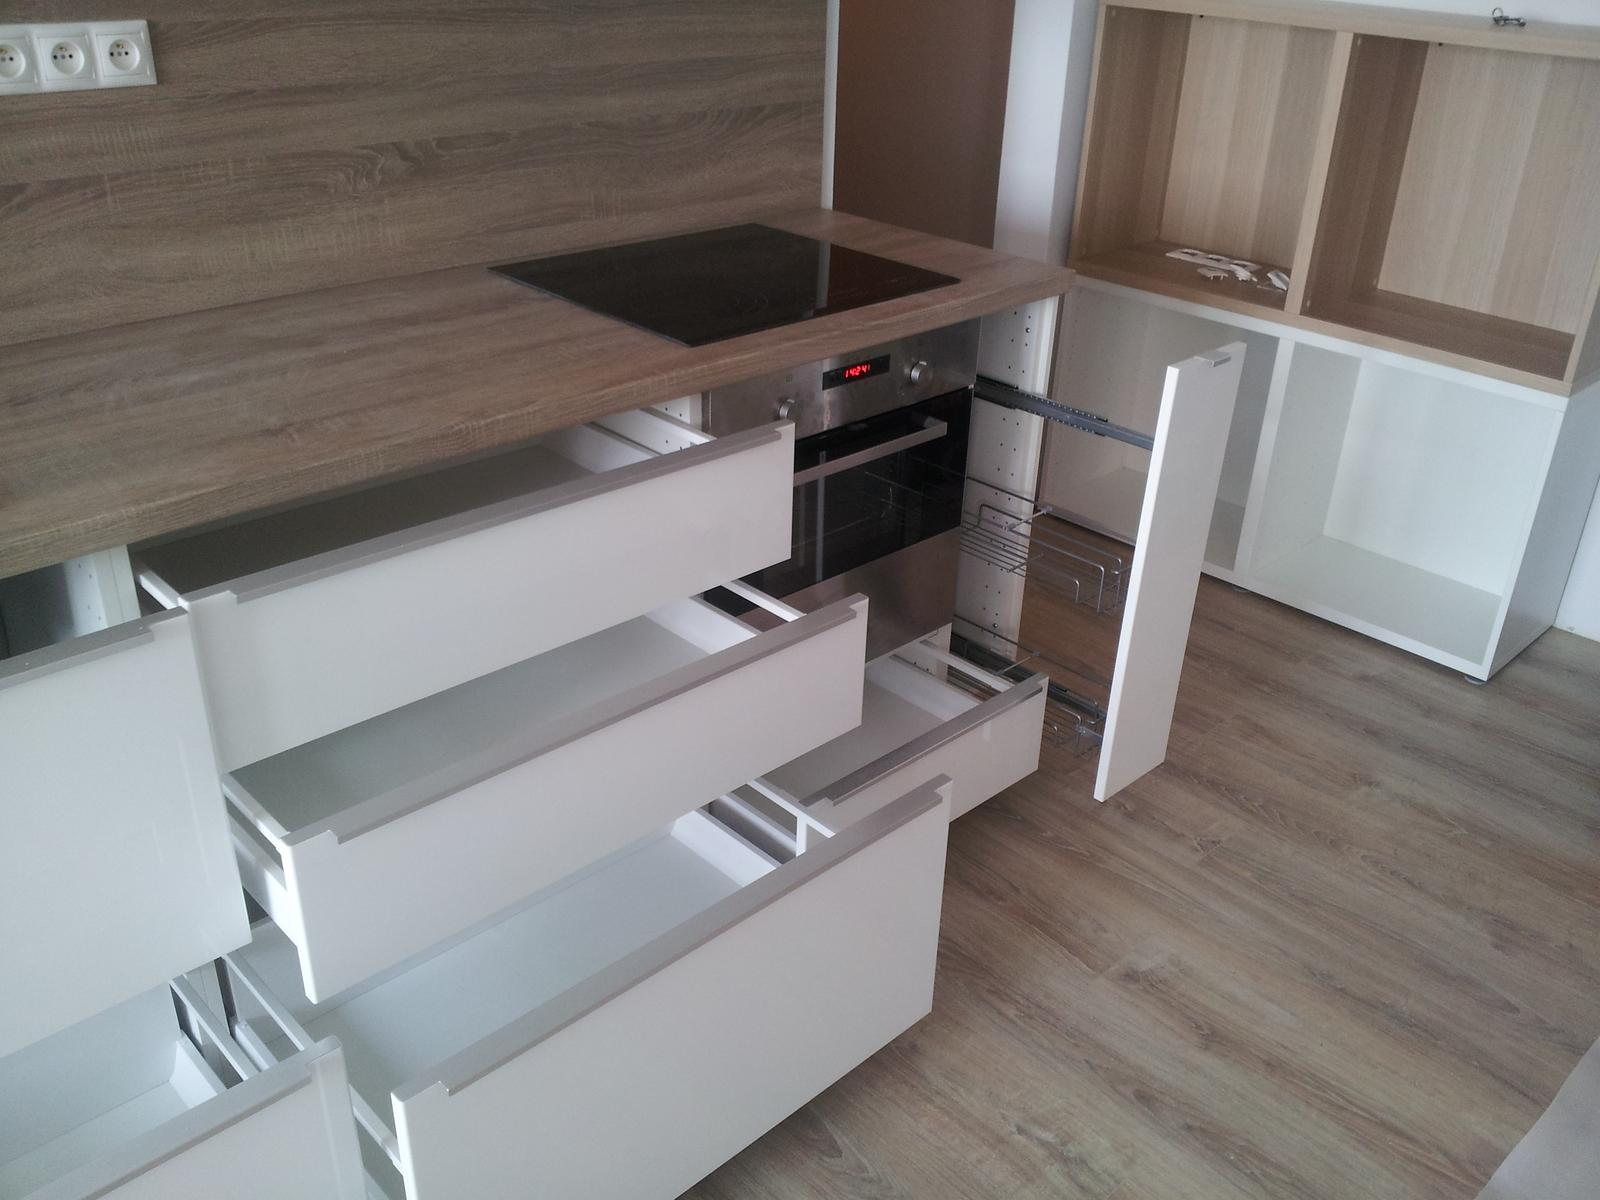 Montáž kuchynskej linky IKEA (Bratislava). - Obrázok č. 10